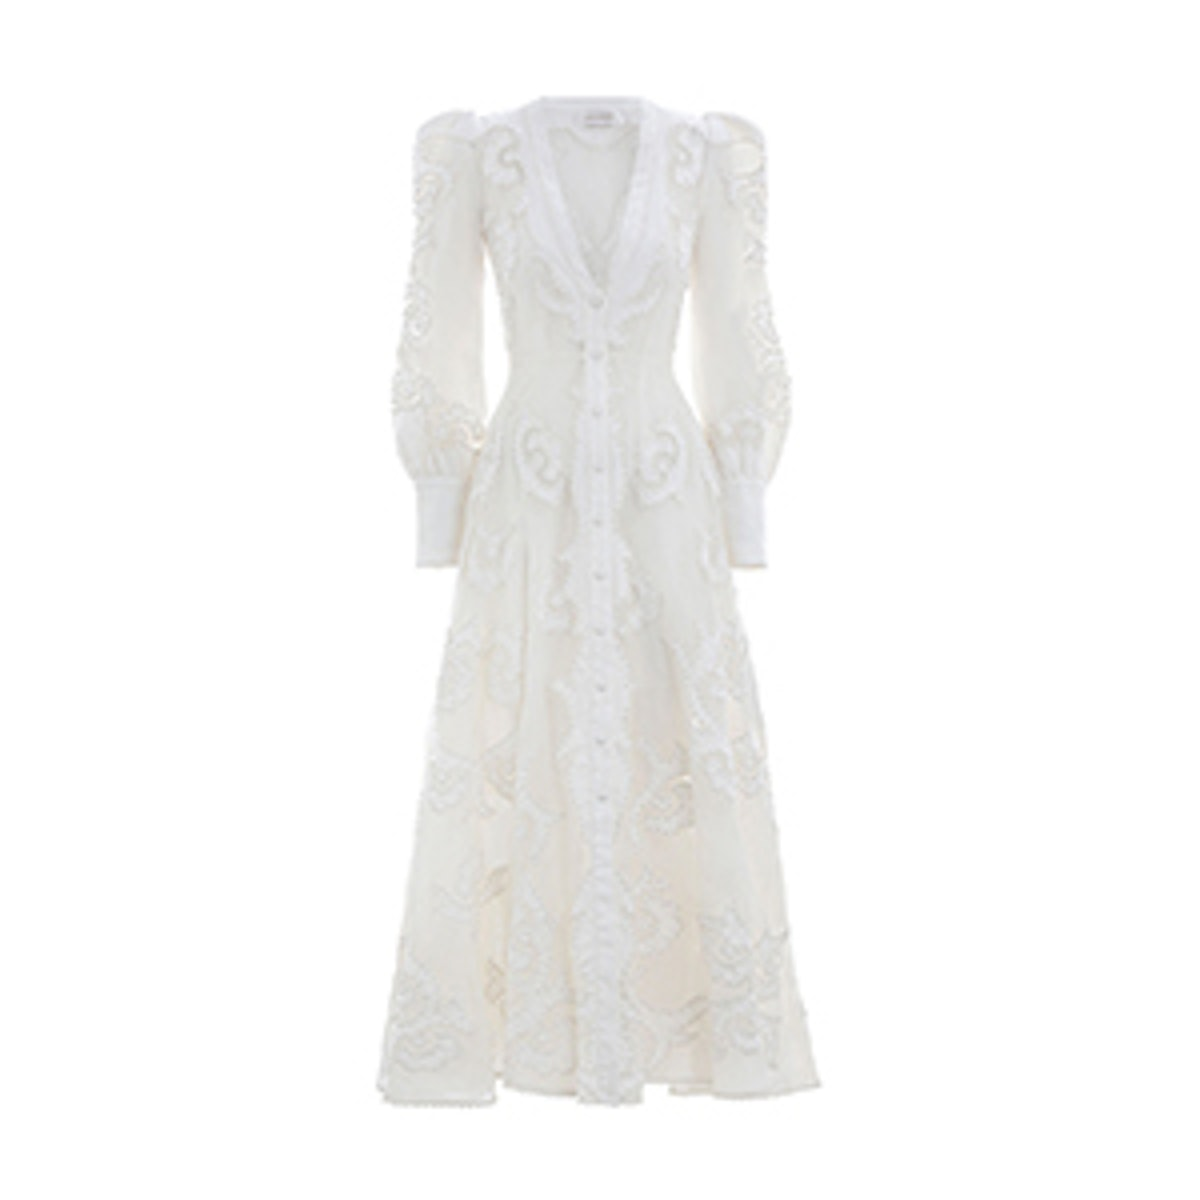 Radiate Applique Dress